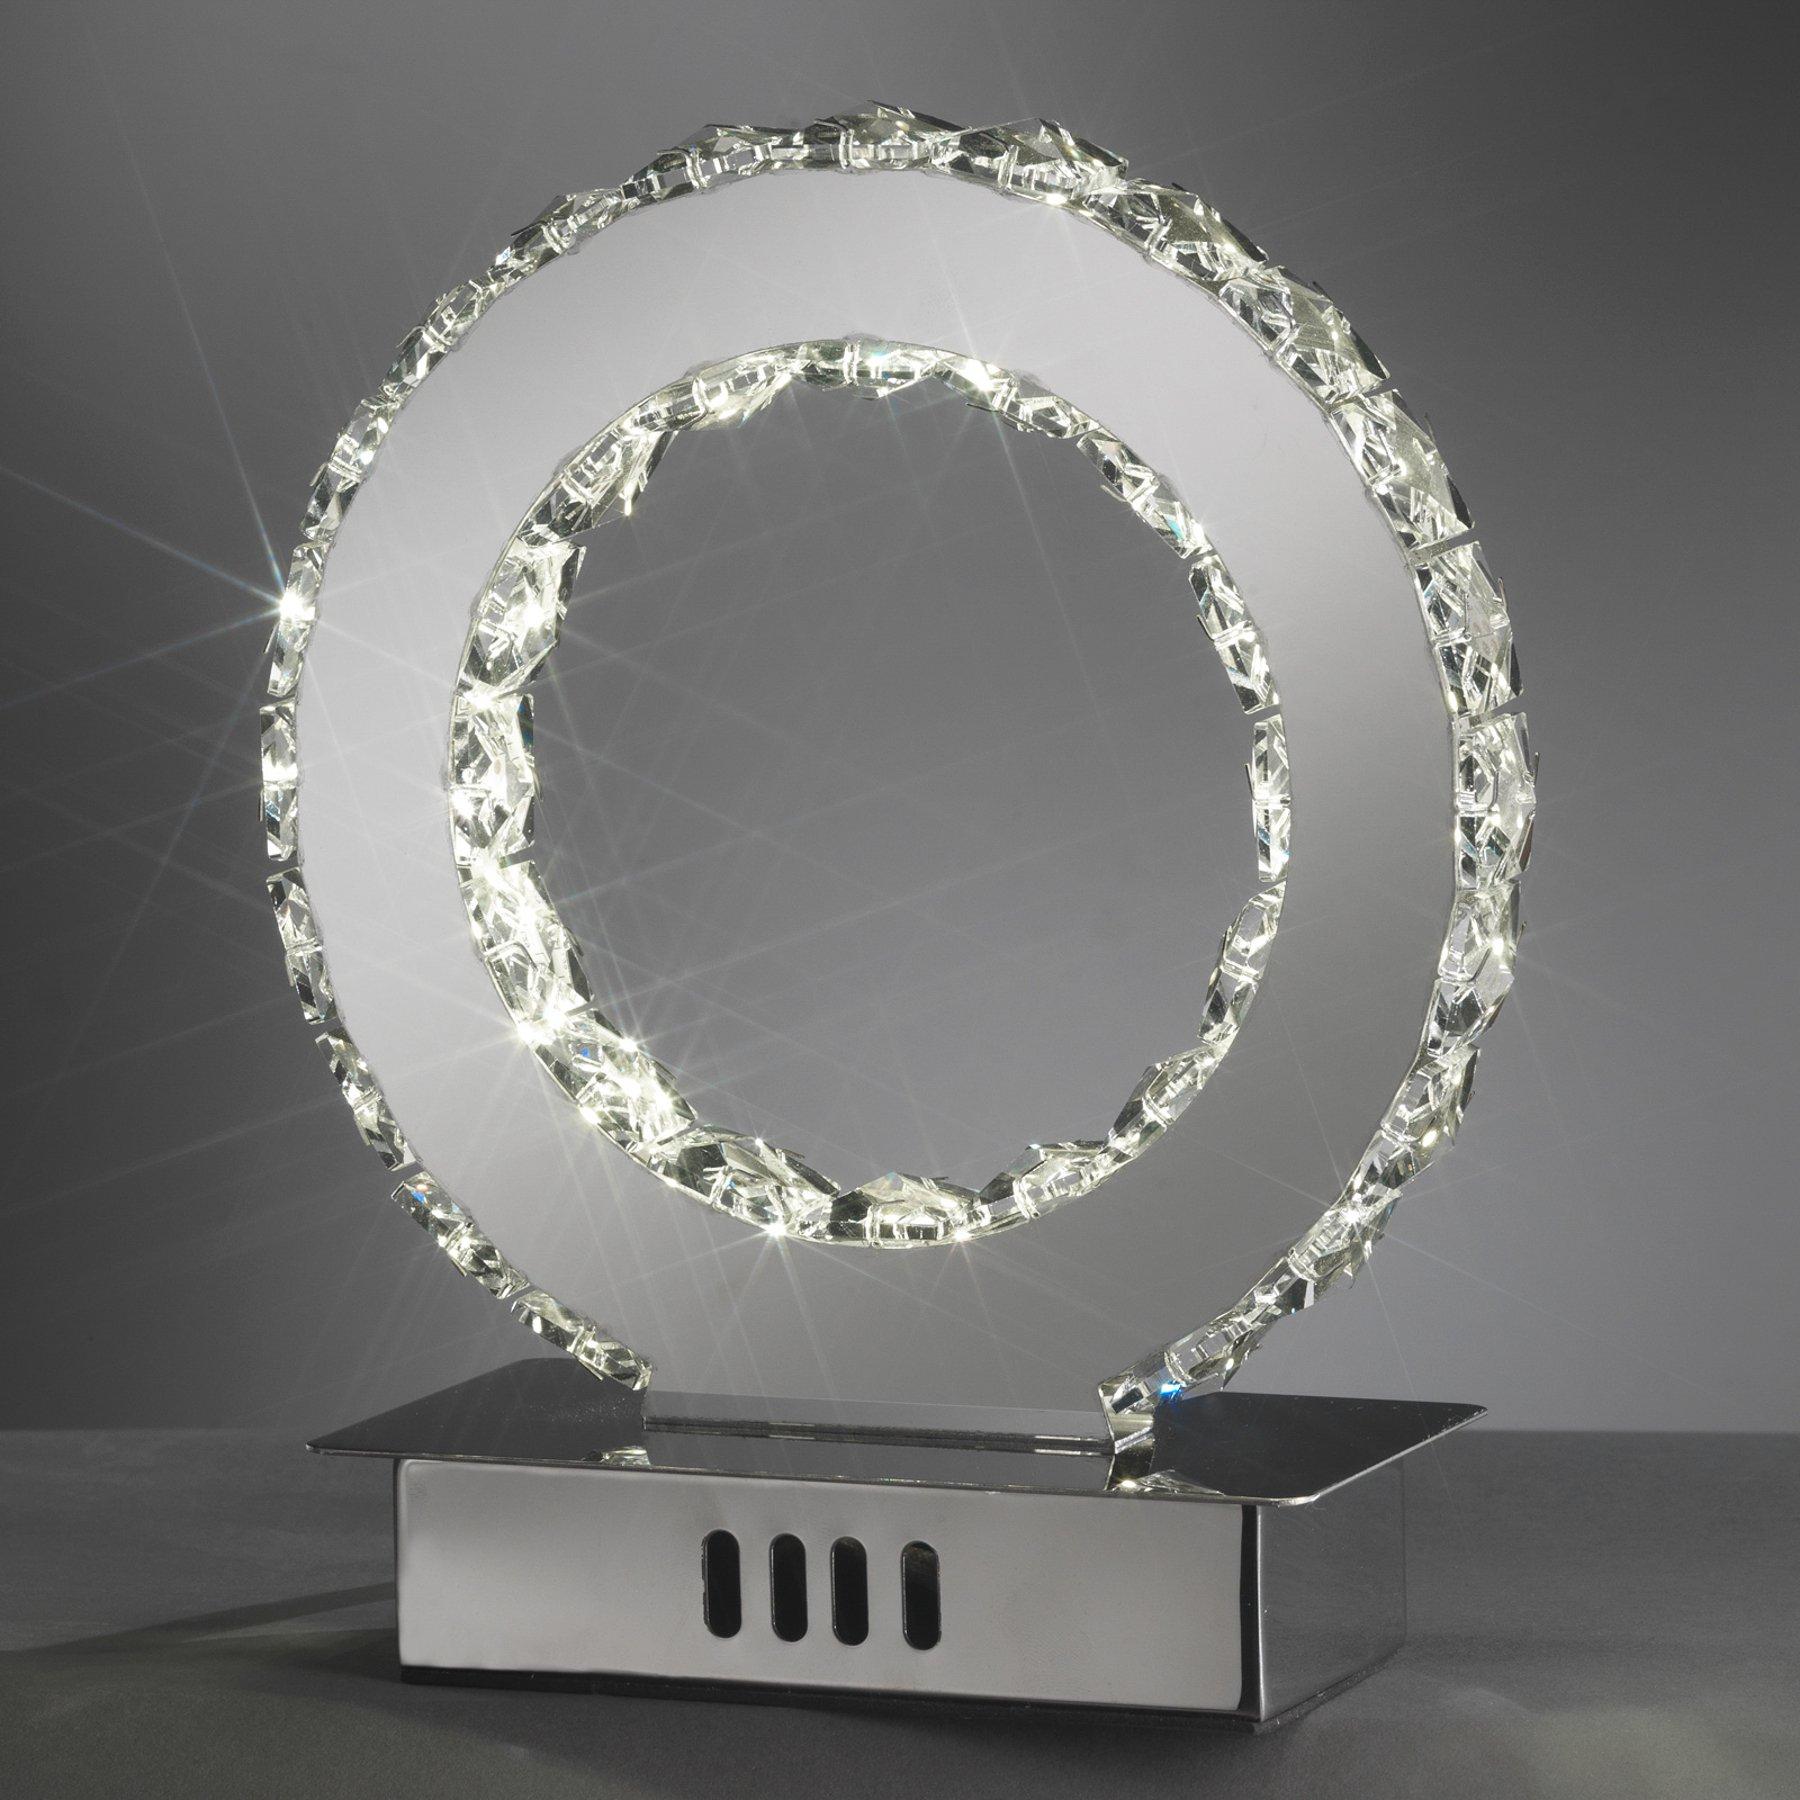 LED-bordlampe Saturno med krystallglass, 22 cm